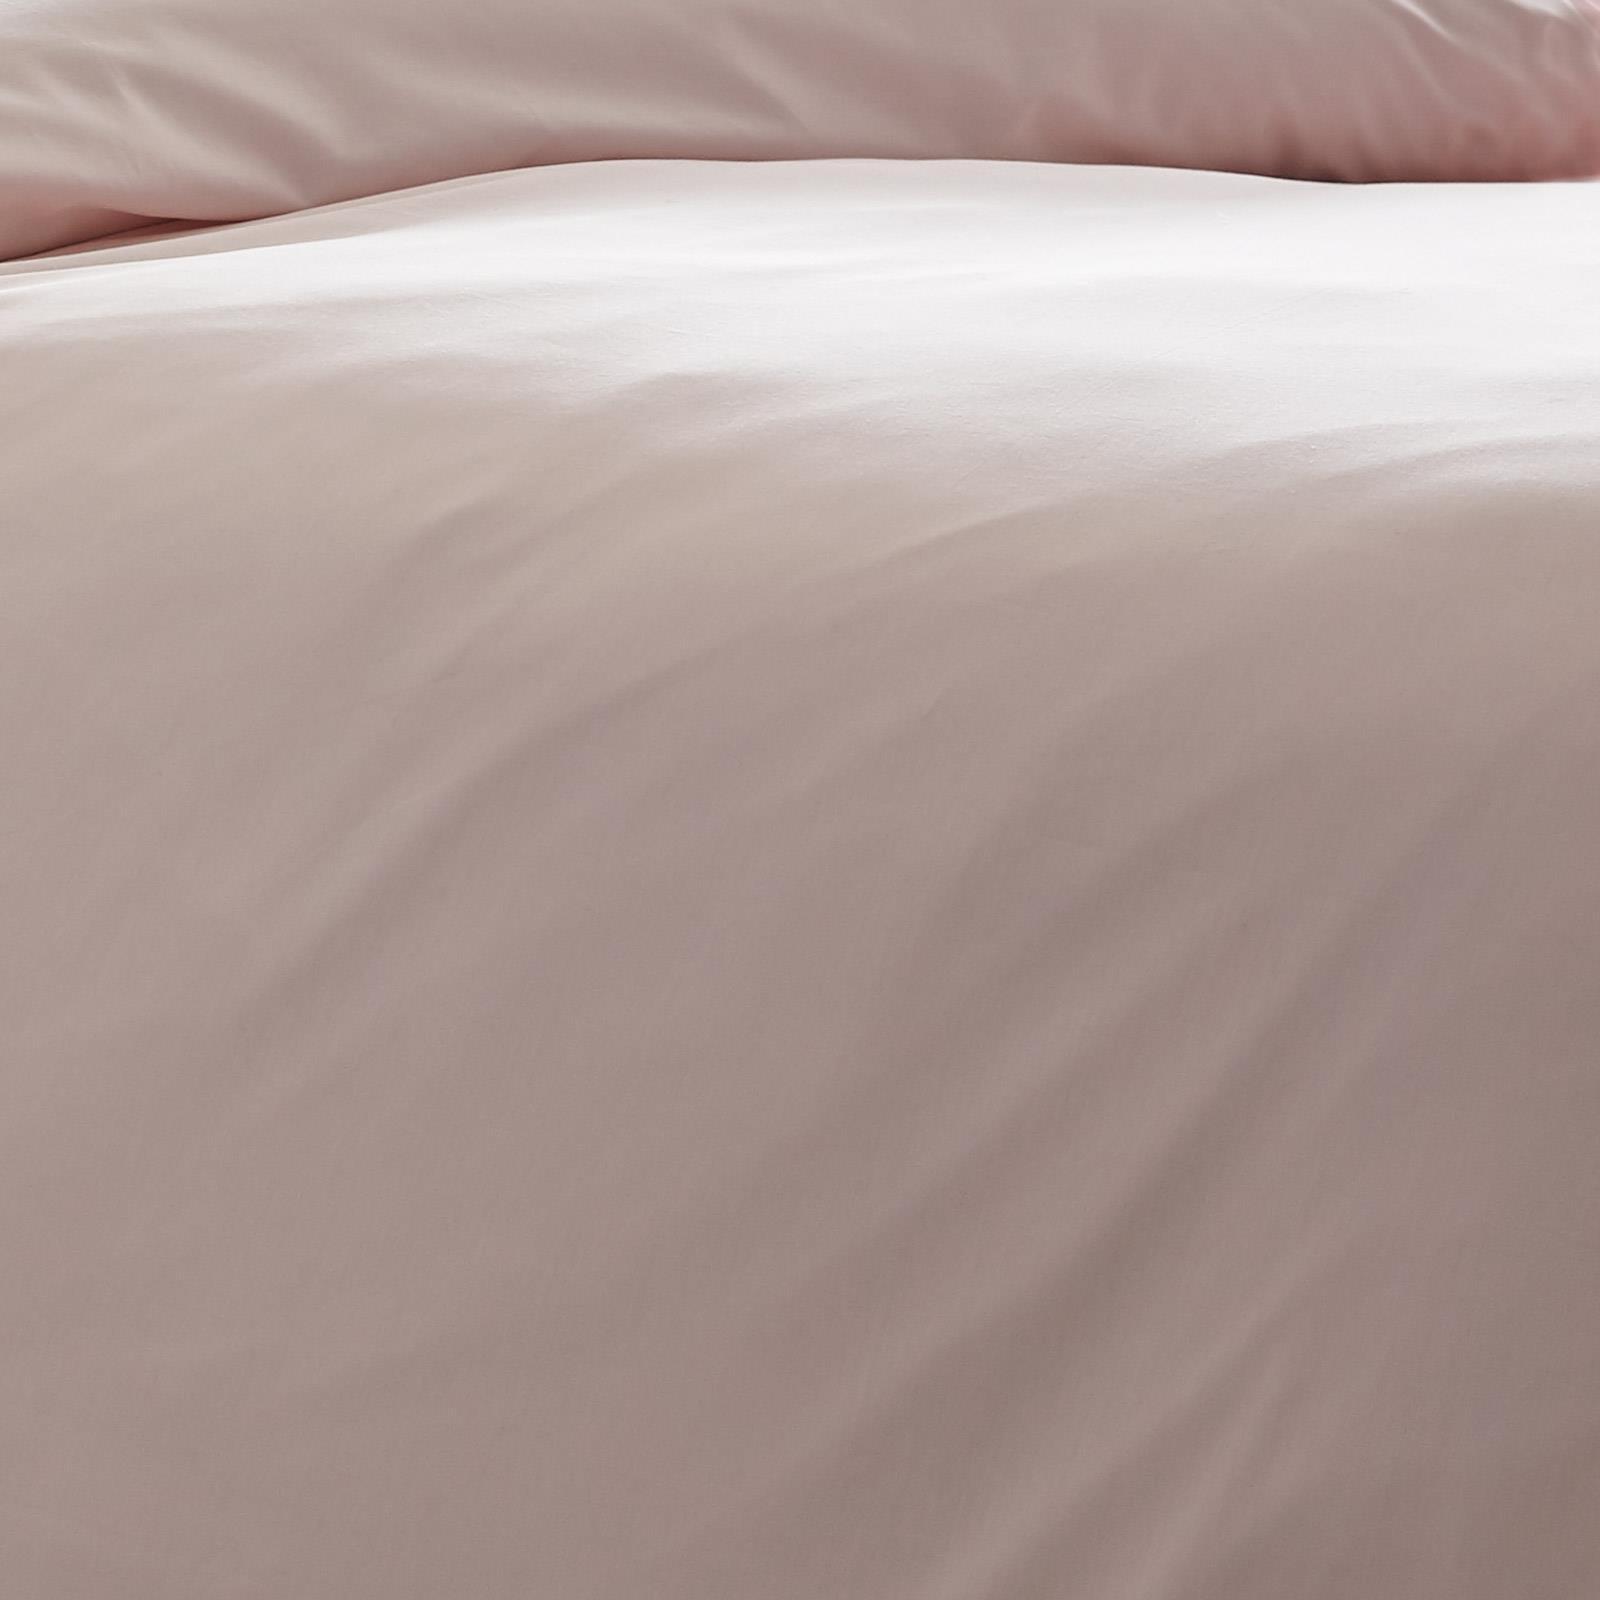 Blush-fundas-nordicas-Rosa-100-algodon-200-Hilos-Llano-Edredon-Conjuntos-de-Cama miniatura 3